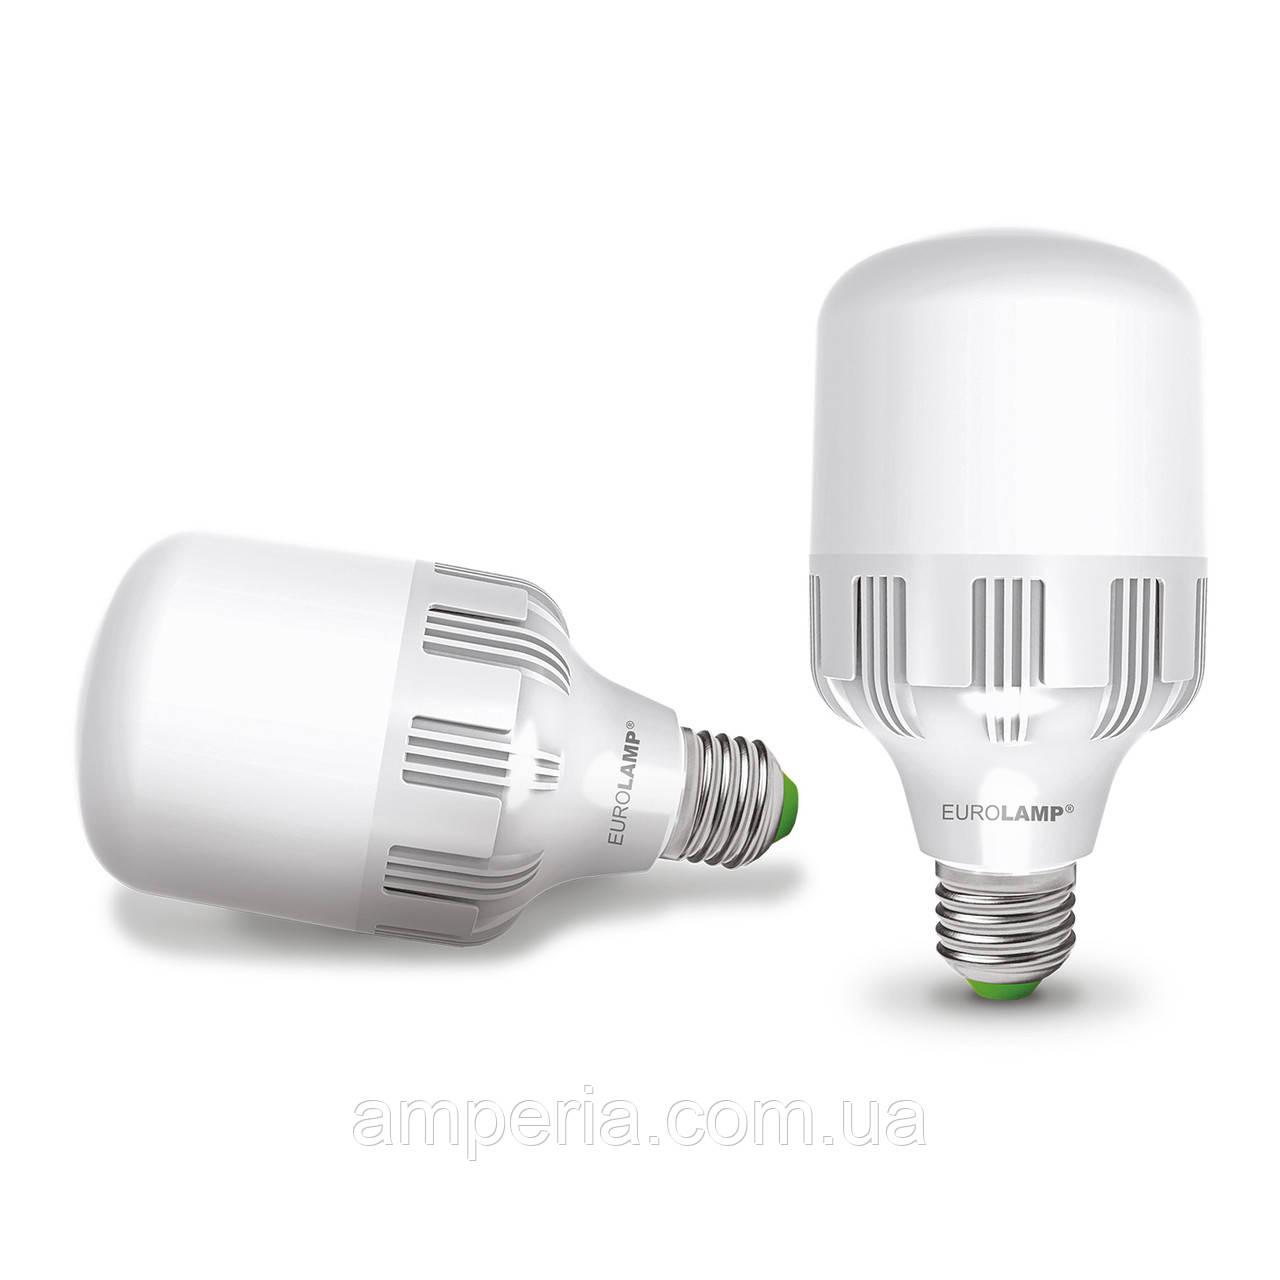 LED Лампа EUROLAMP високопотужна 30W E27 6500K (LED-HP-30276)